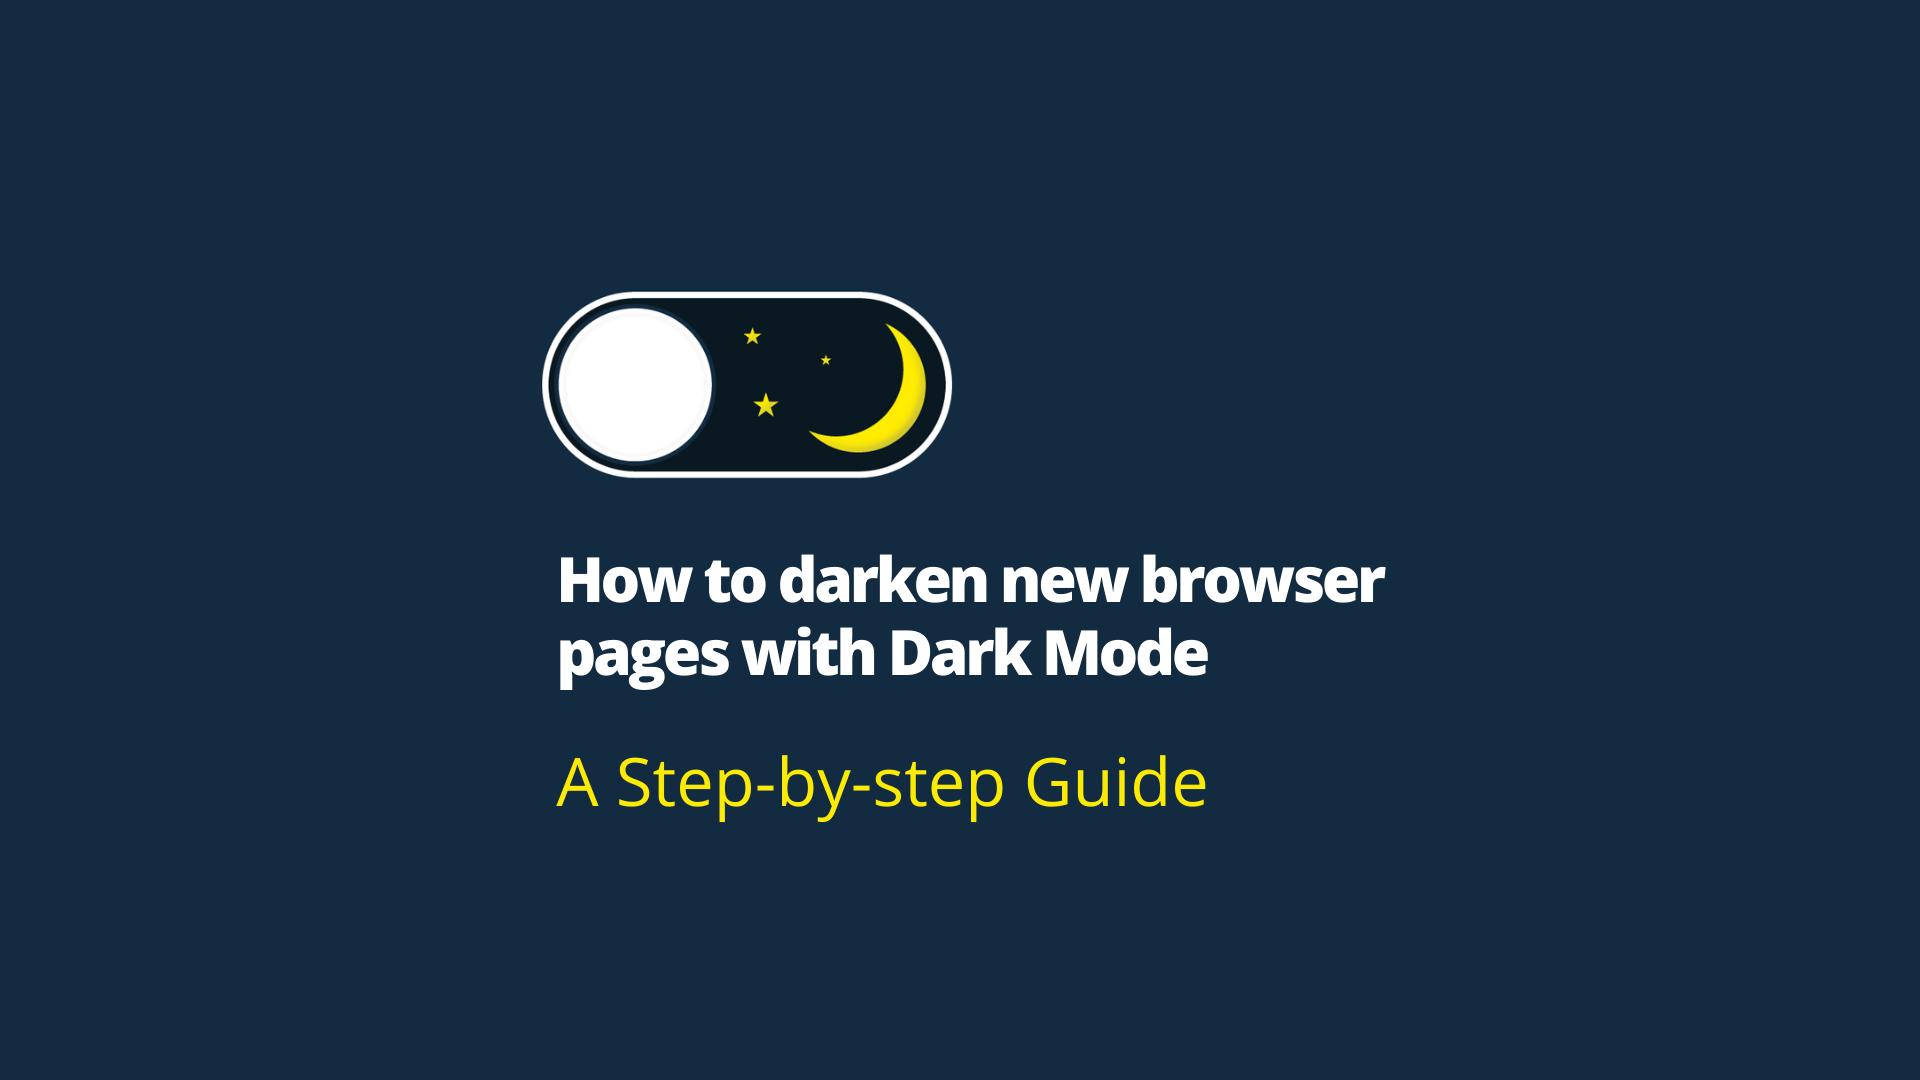 What is Dark Mode?